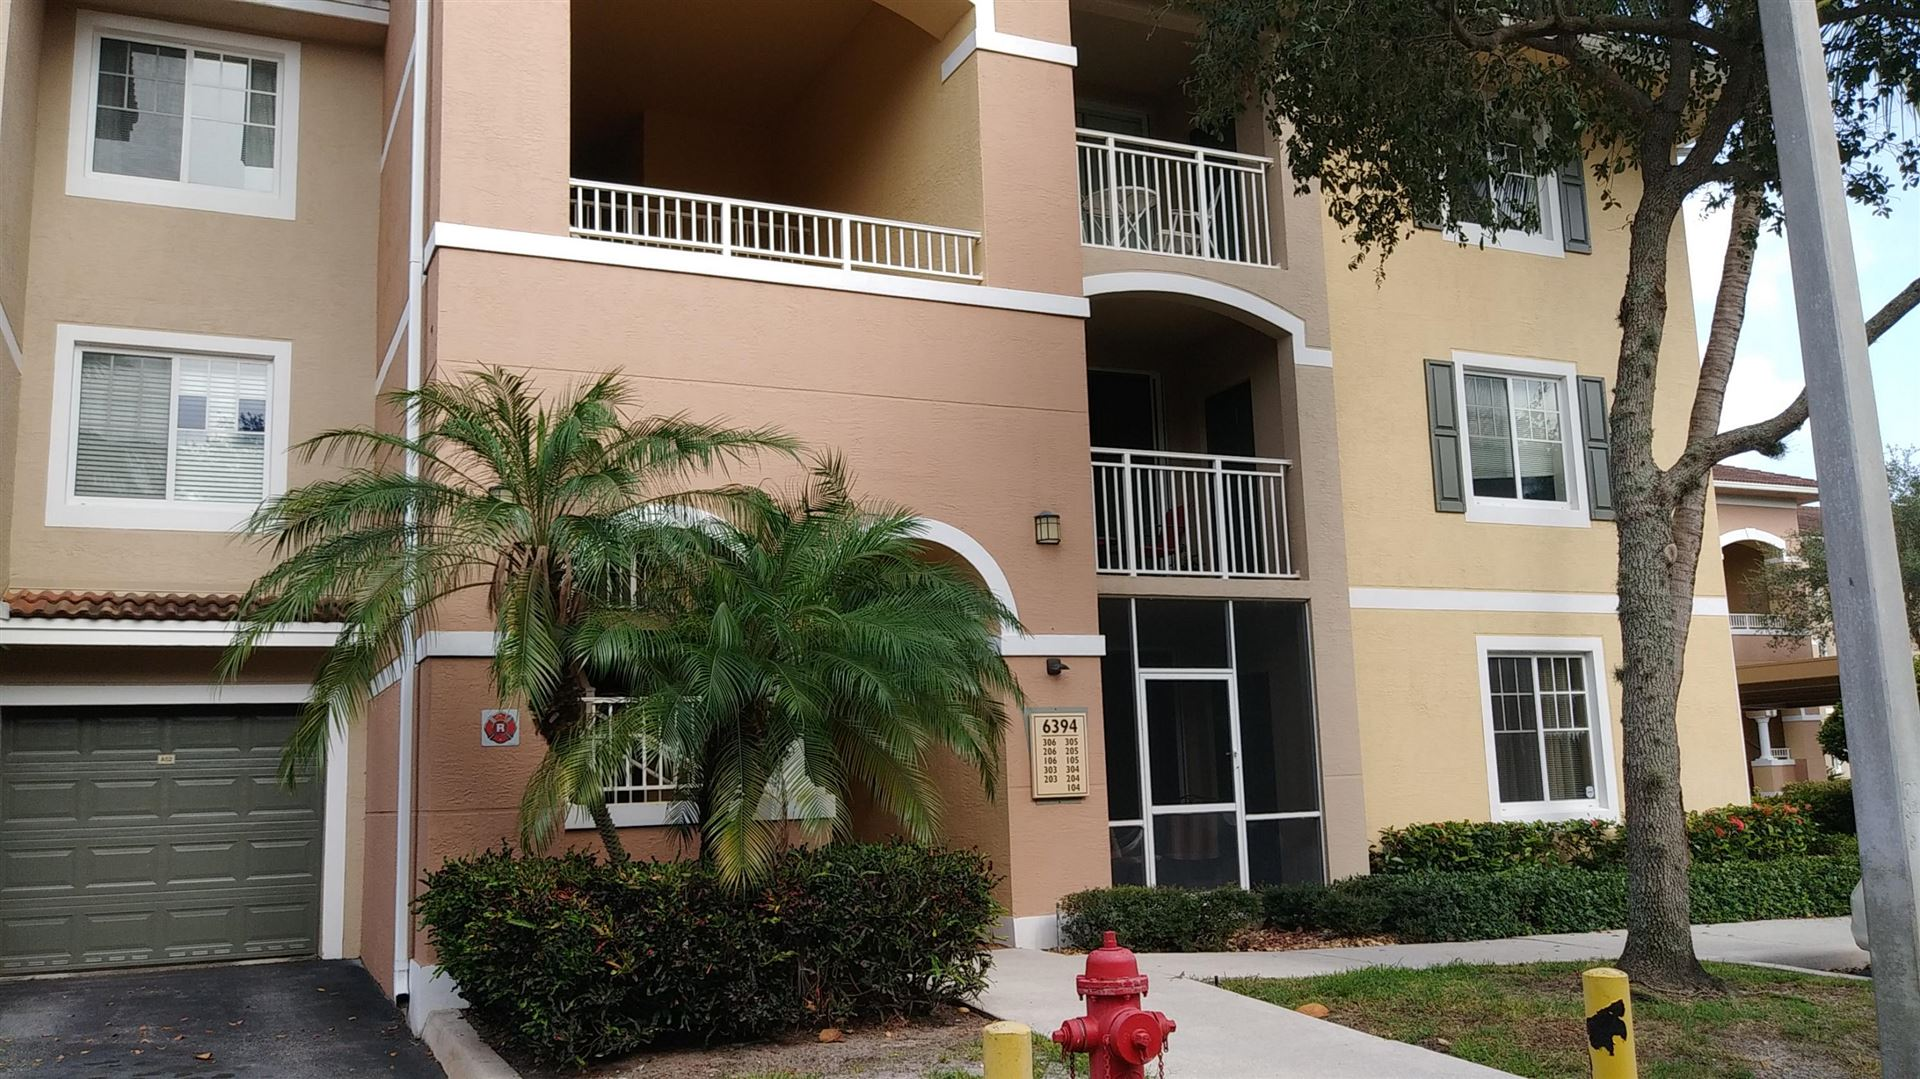 6394 Emerald Dunes Drive #104, West Palm Beach, FL 33411 - #: RX-10634359